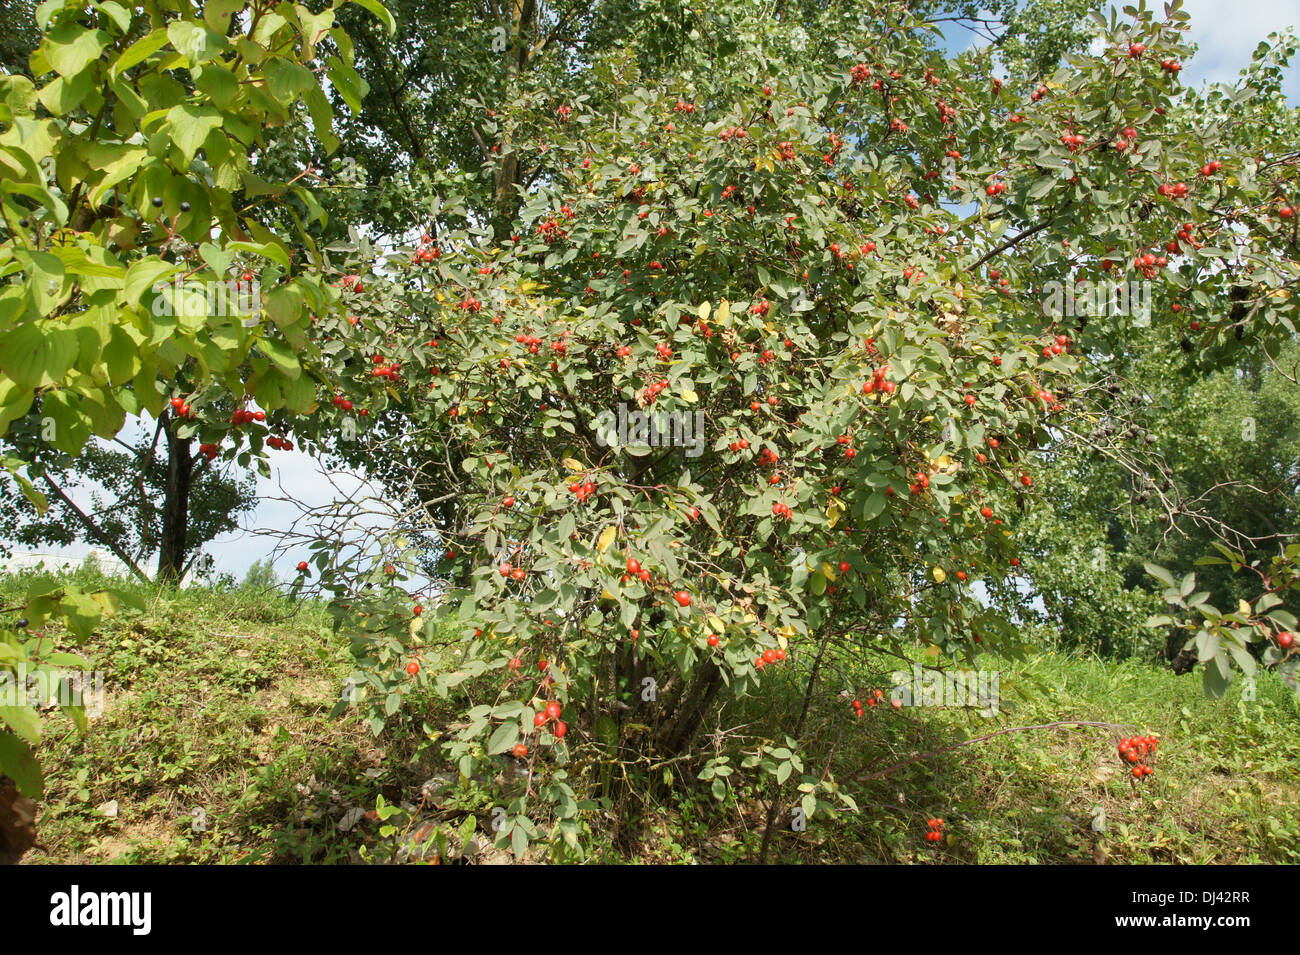 Rosa glauca, Blaue Hechtrose, redleaf rose - Stock Image